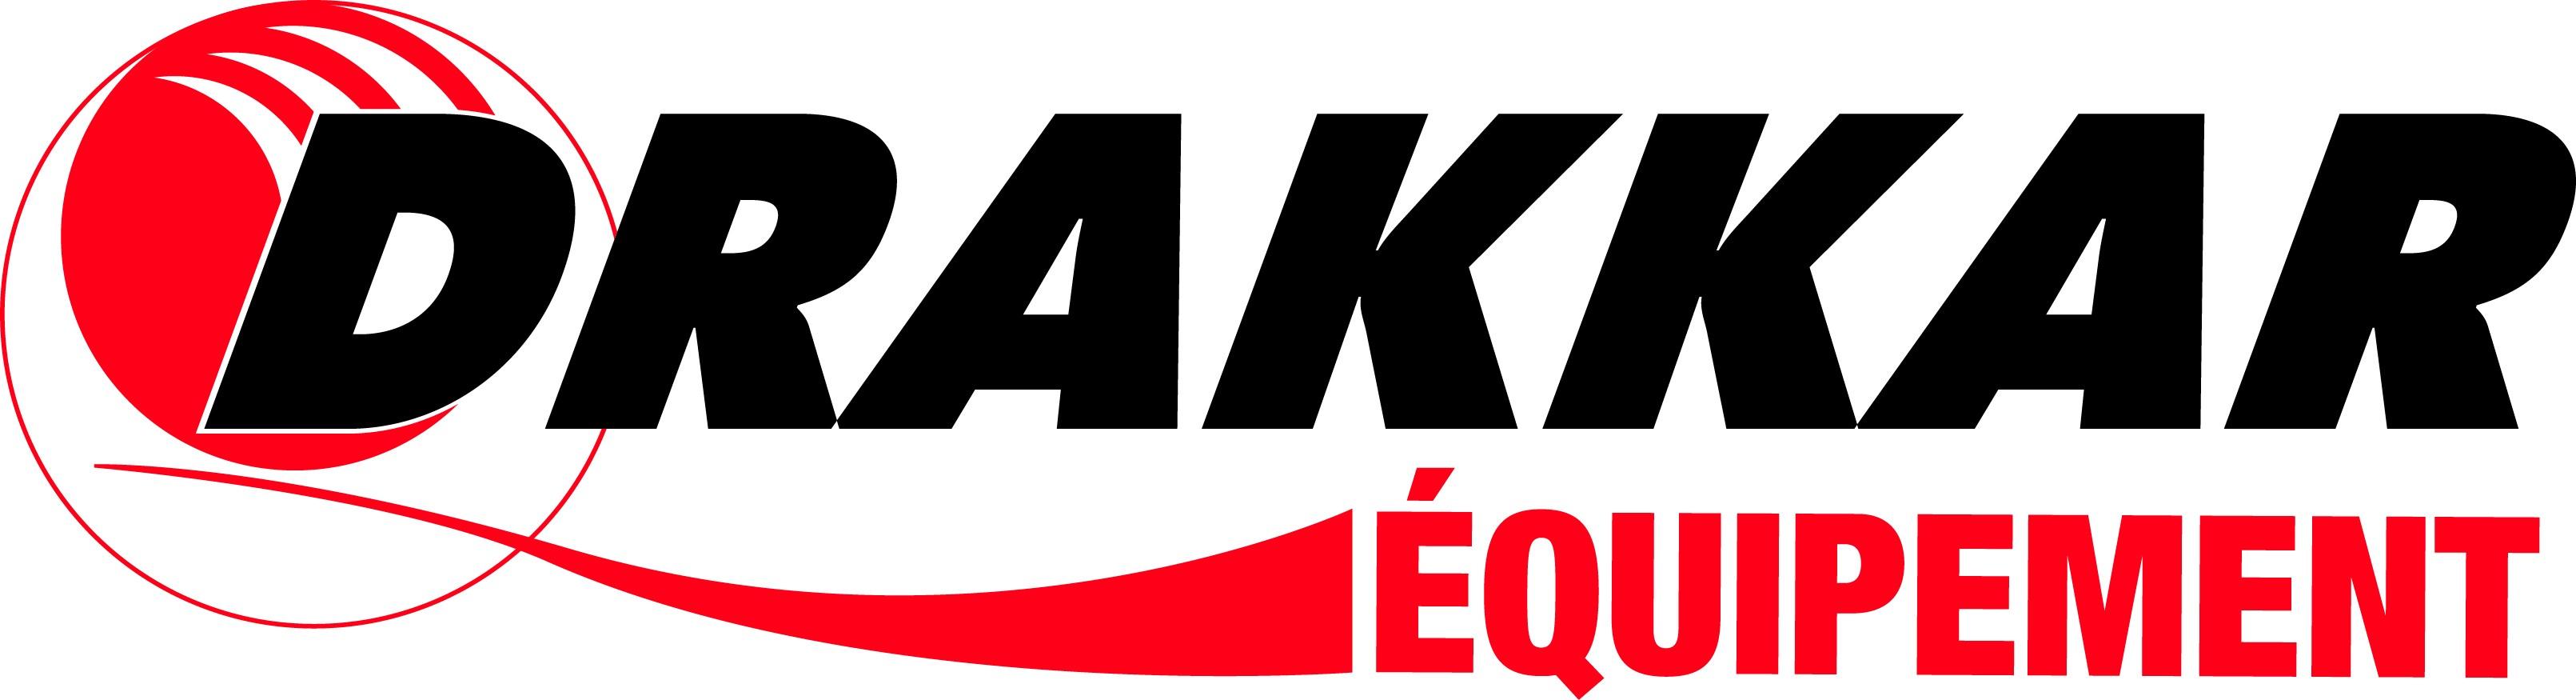 Drakkar Equipement